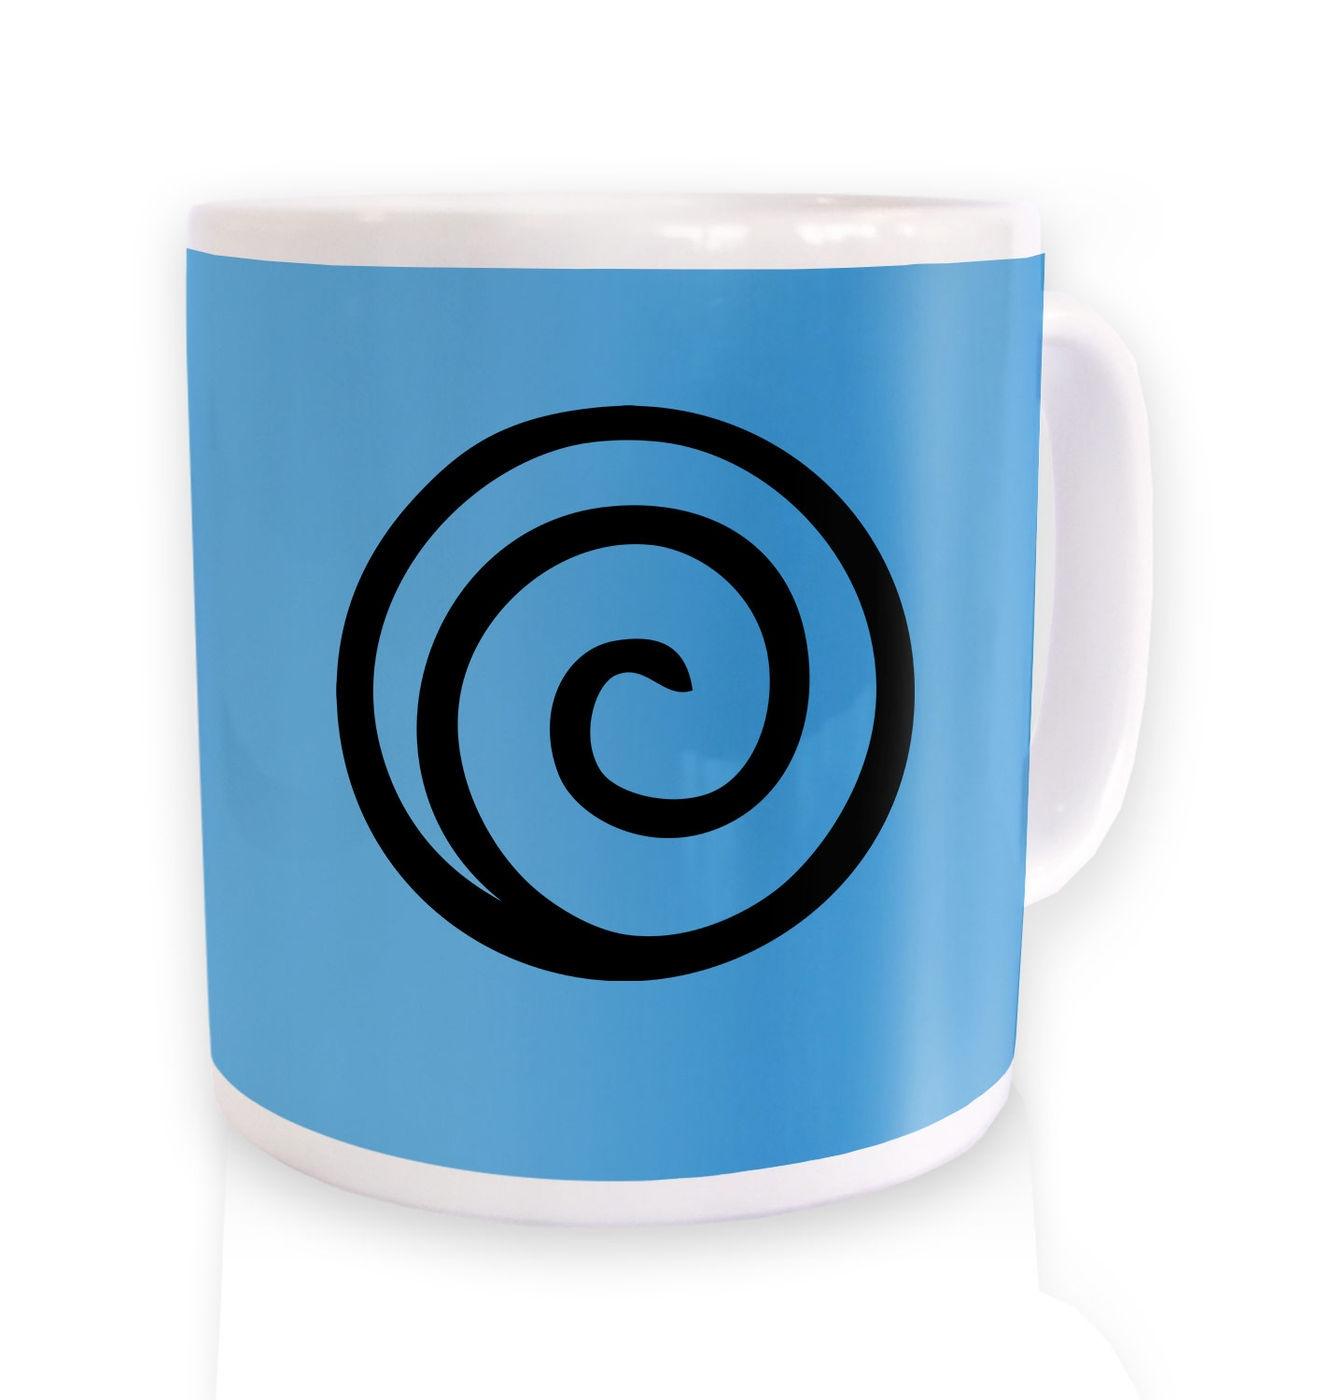 Demon Locking Seal ceramic coffee mug